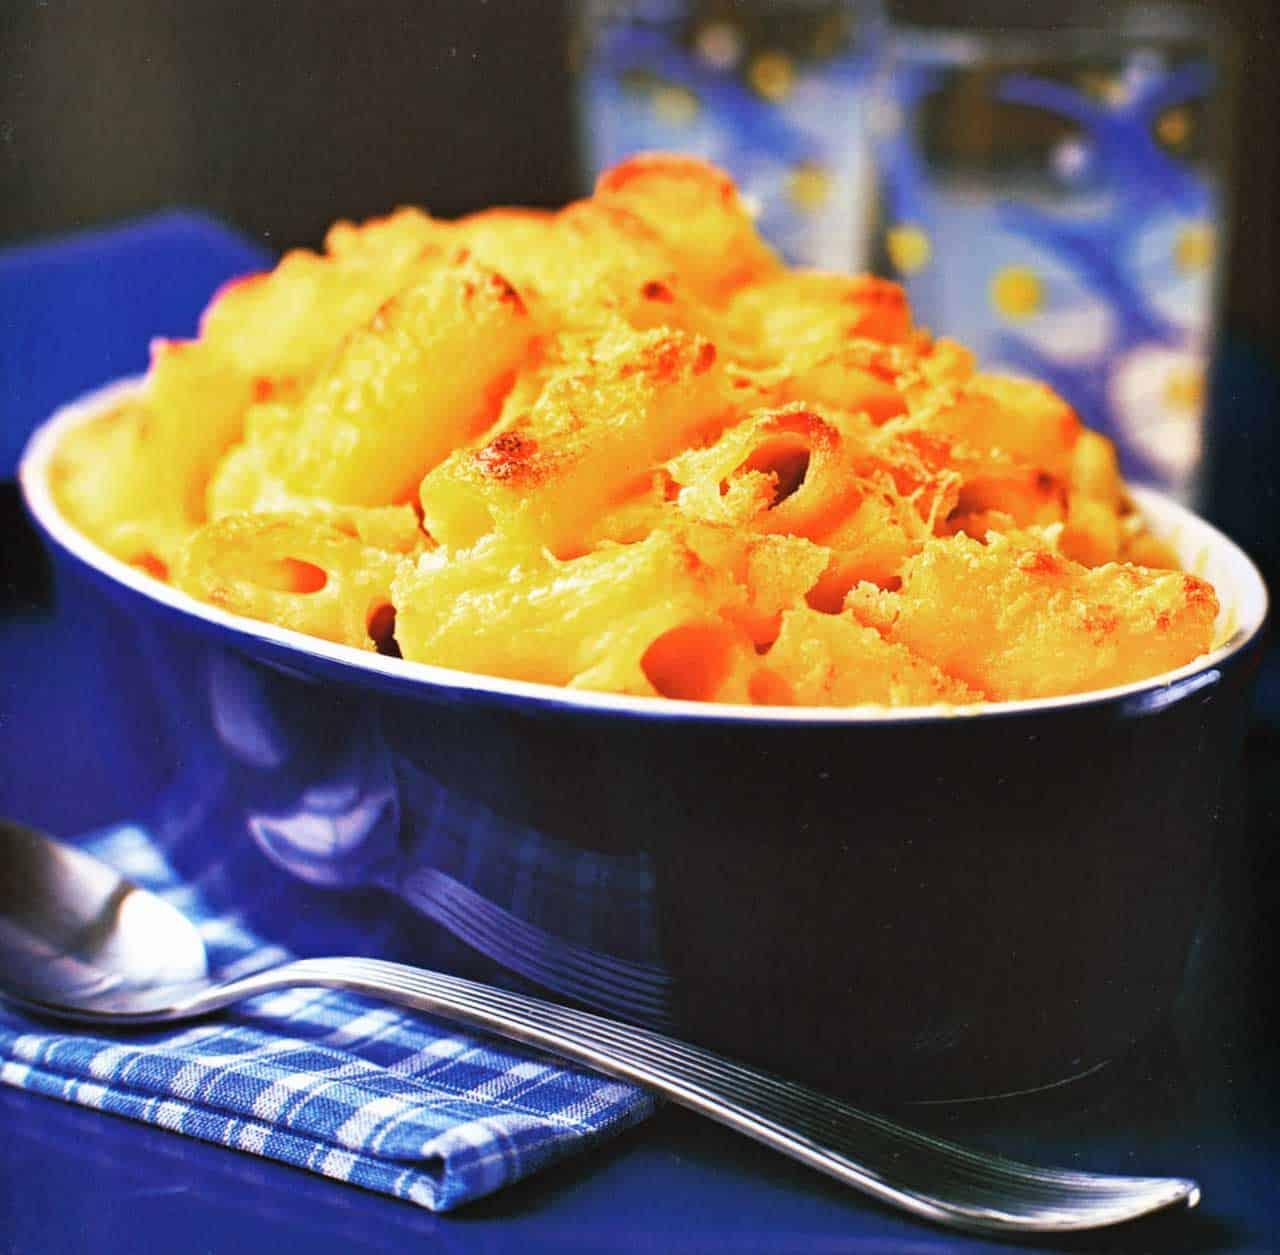 recipe macaroni cheese-cheese and macaroni recipes www.eatopic.com